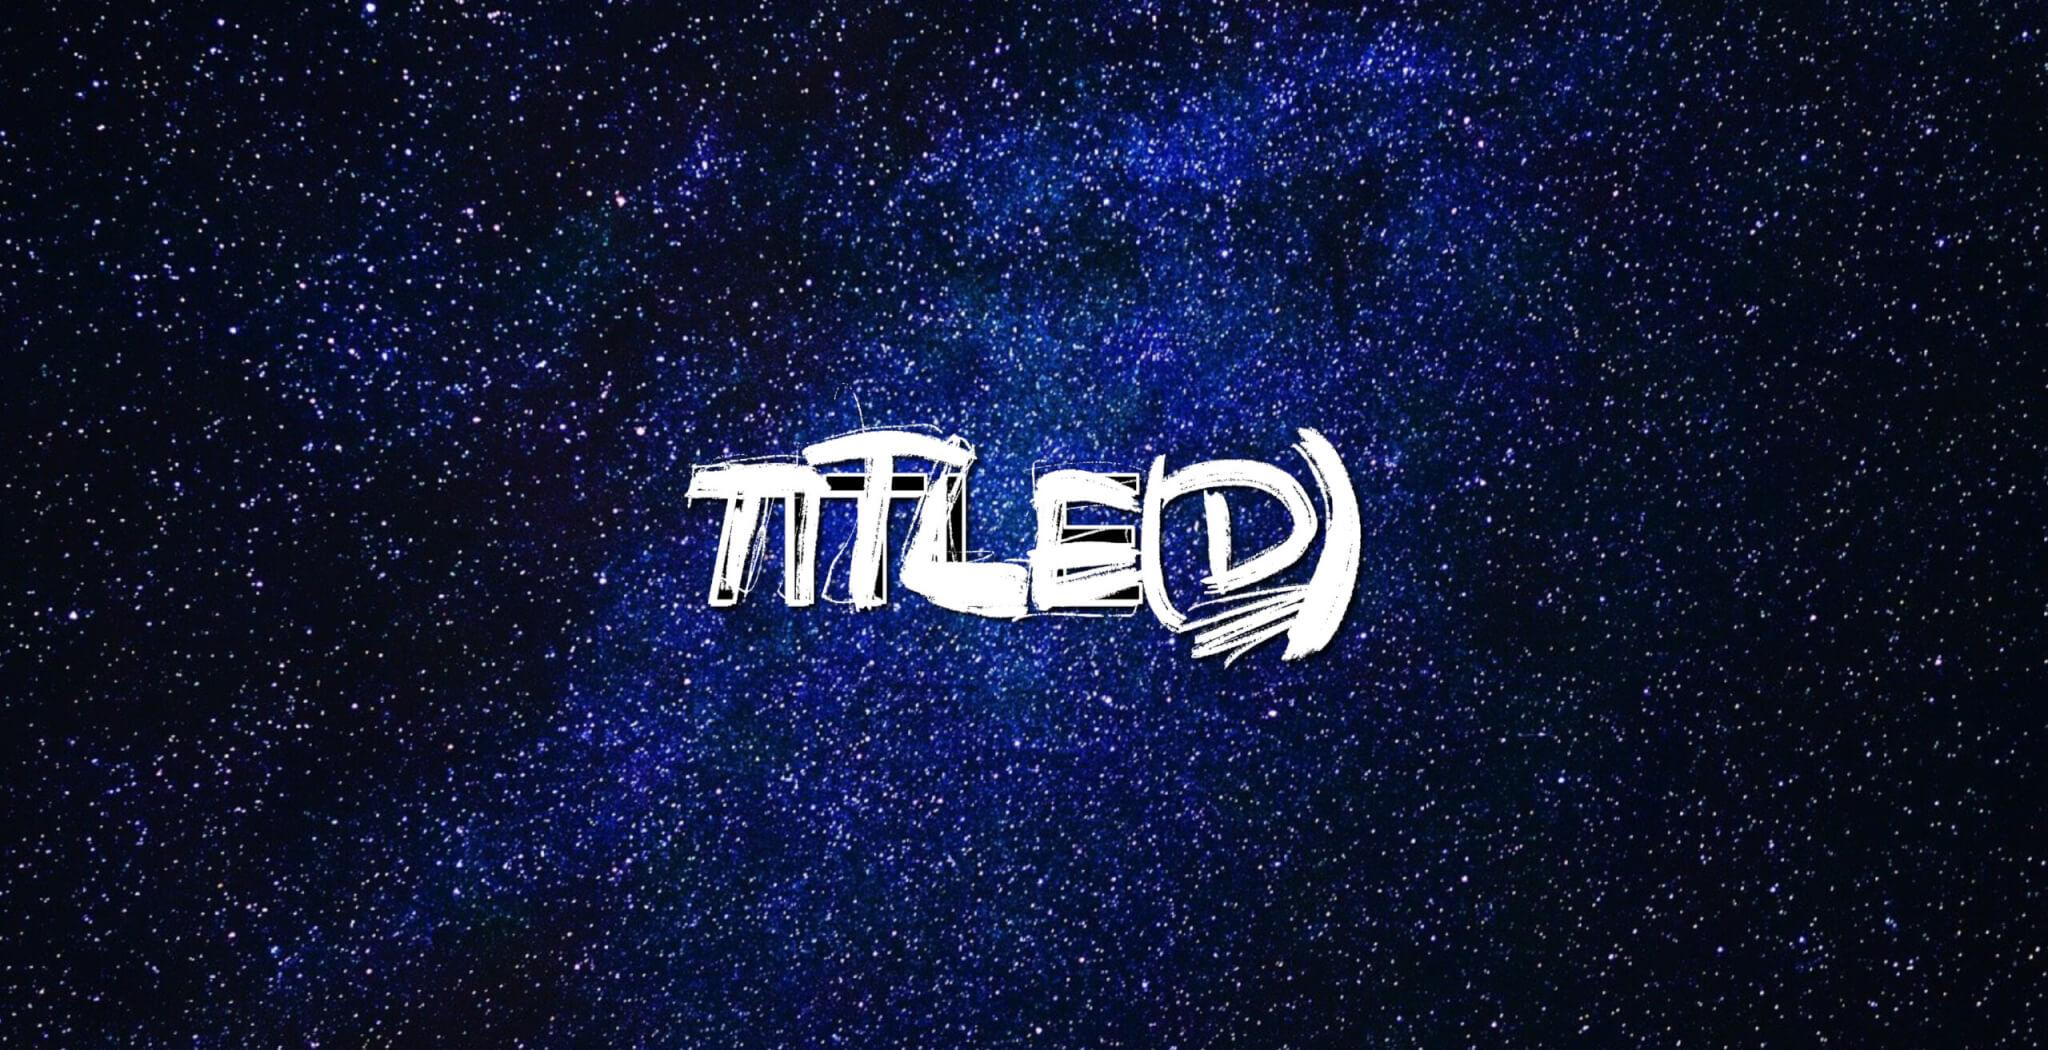 ASTRO TITLE(D)